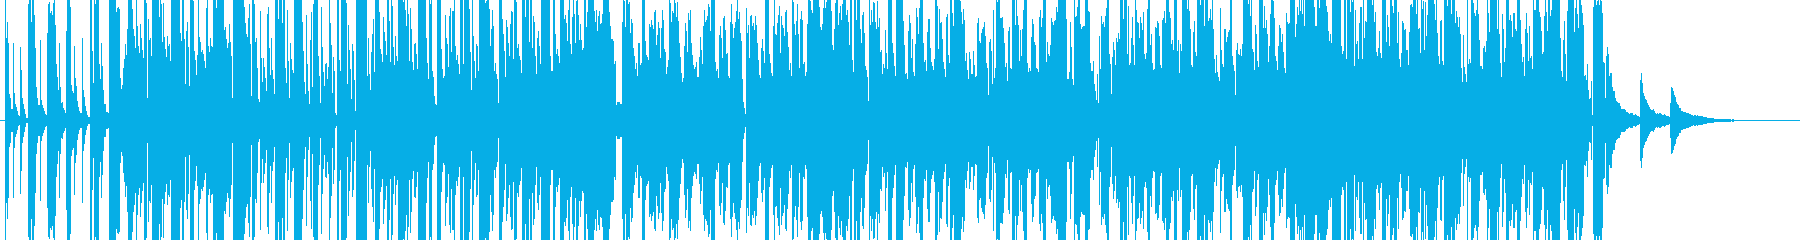 kawaii pop おしゃれで可愛い曲の再生済みの波形